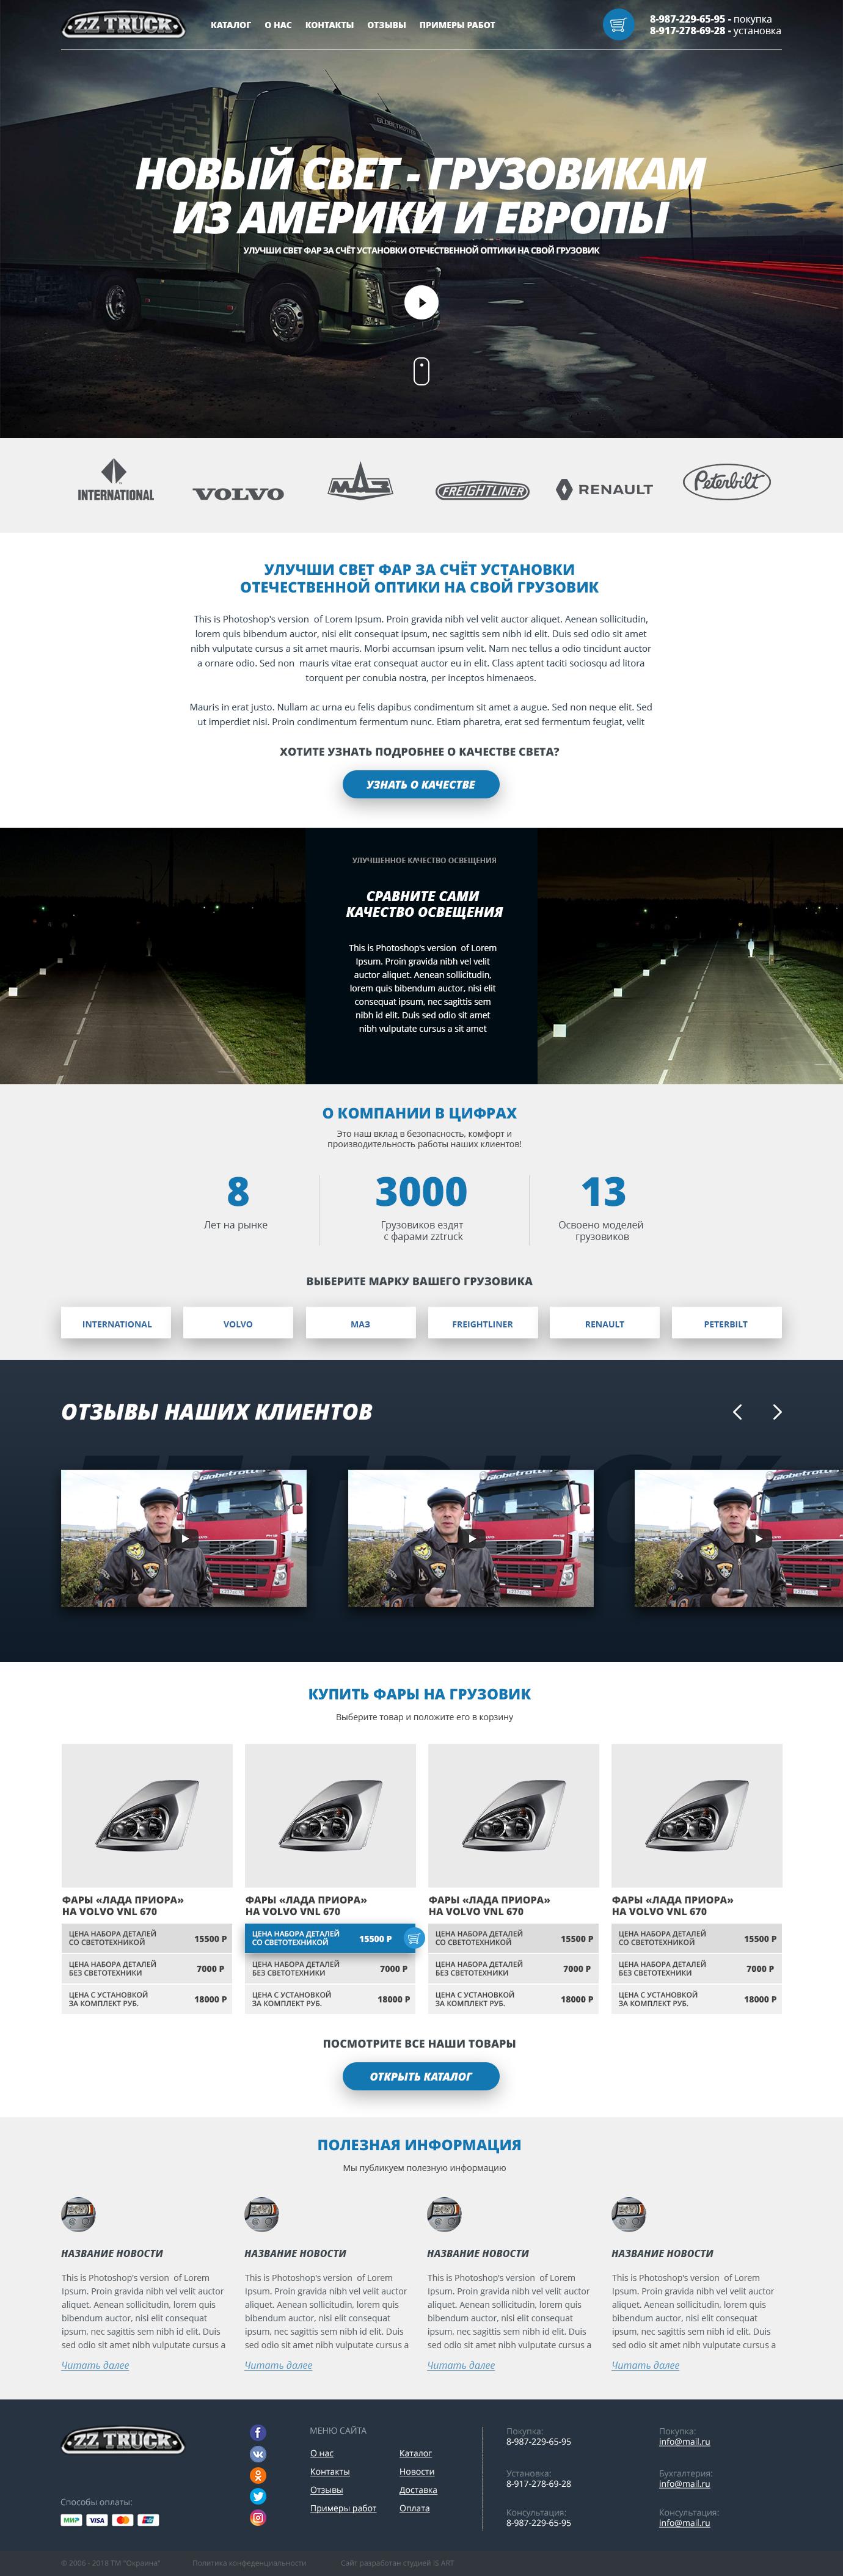 Макет сайта Тюннинг грузовиков 1